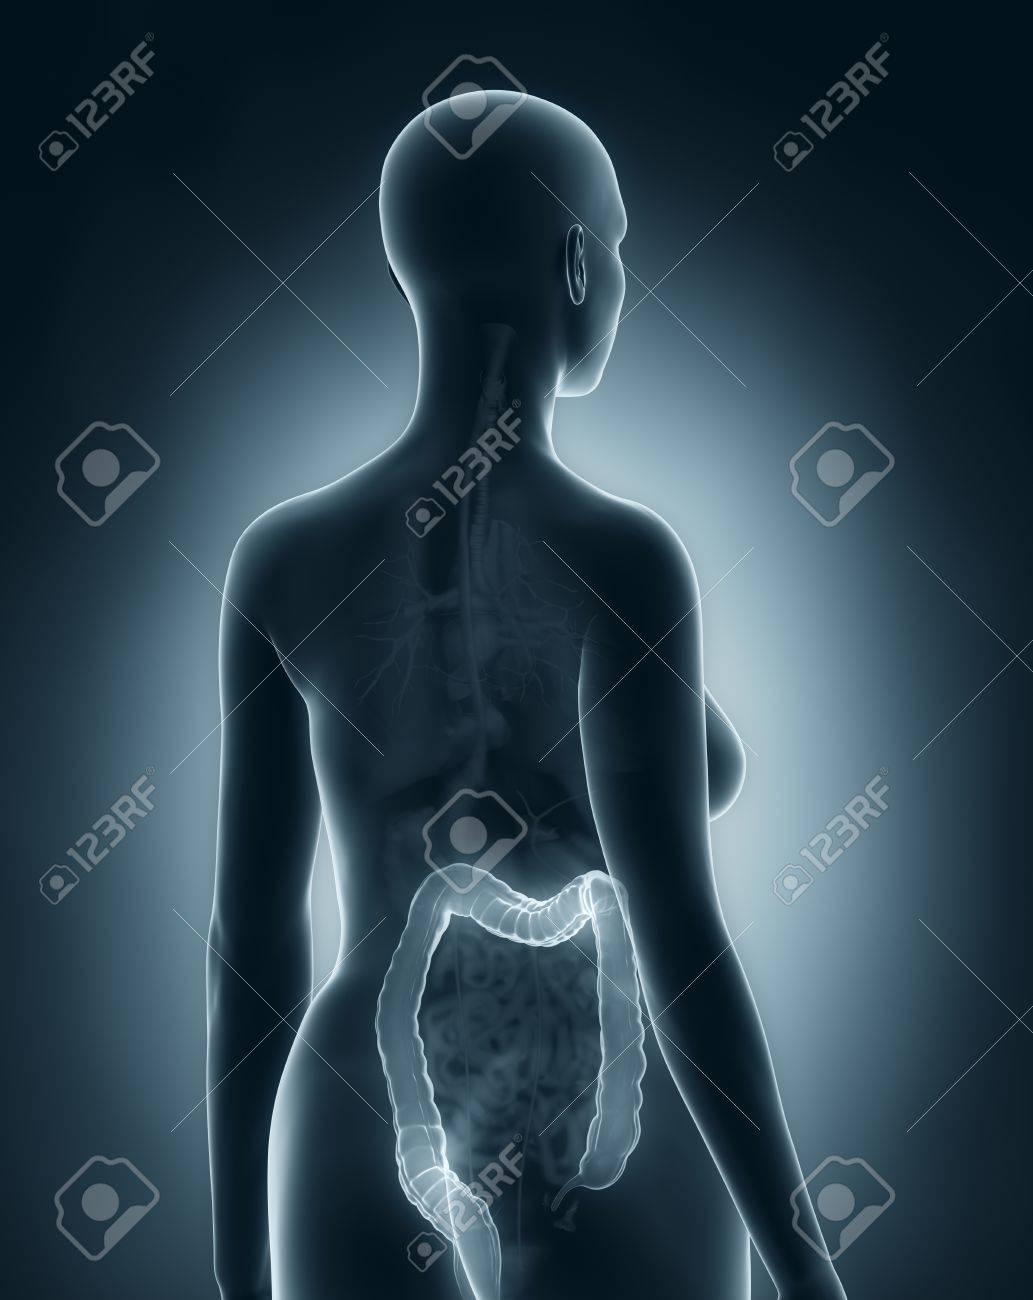 Woman colon anatomy x-ray black posterior view Stock Photo - 24341651